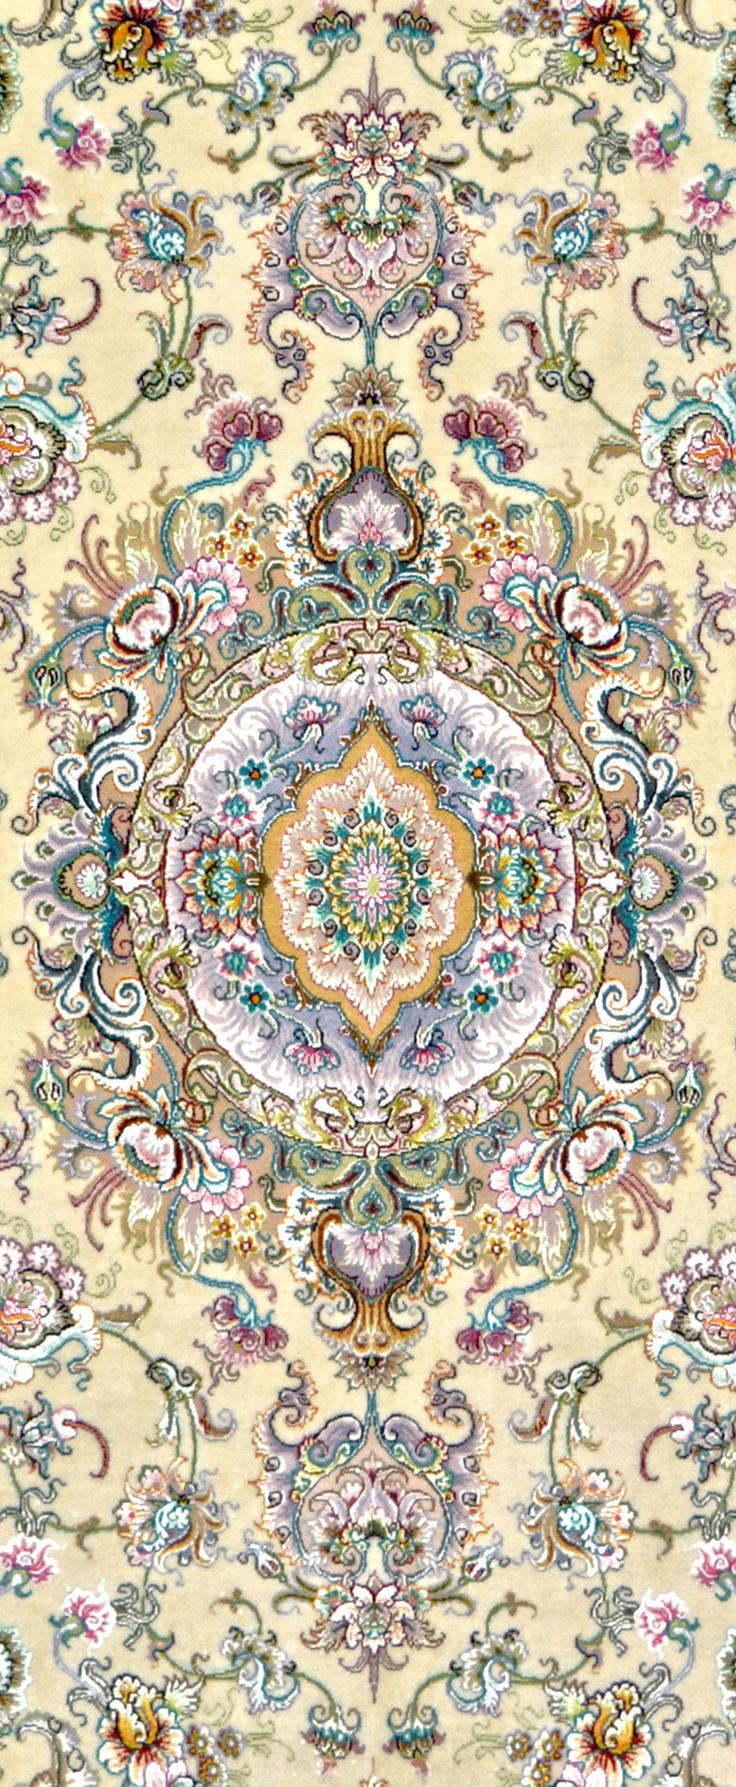 5x7 Tabriz Very Fine Persian Area Rug